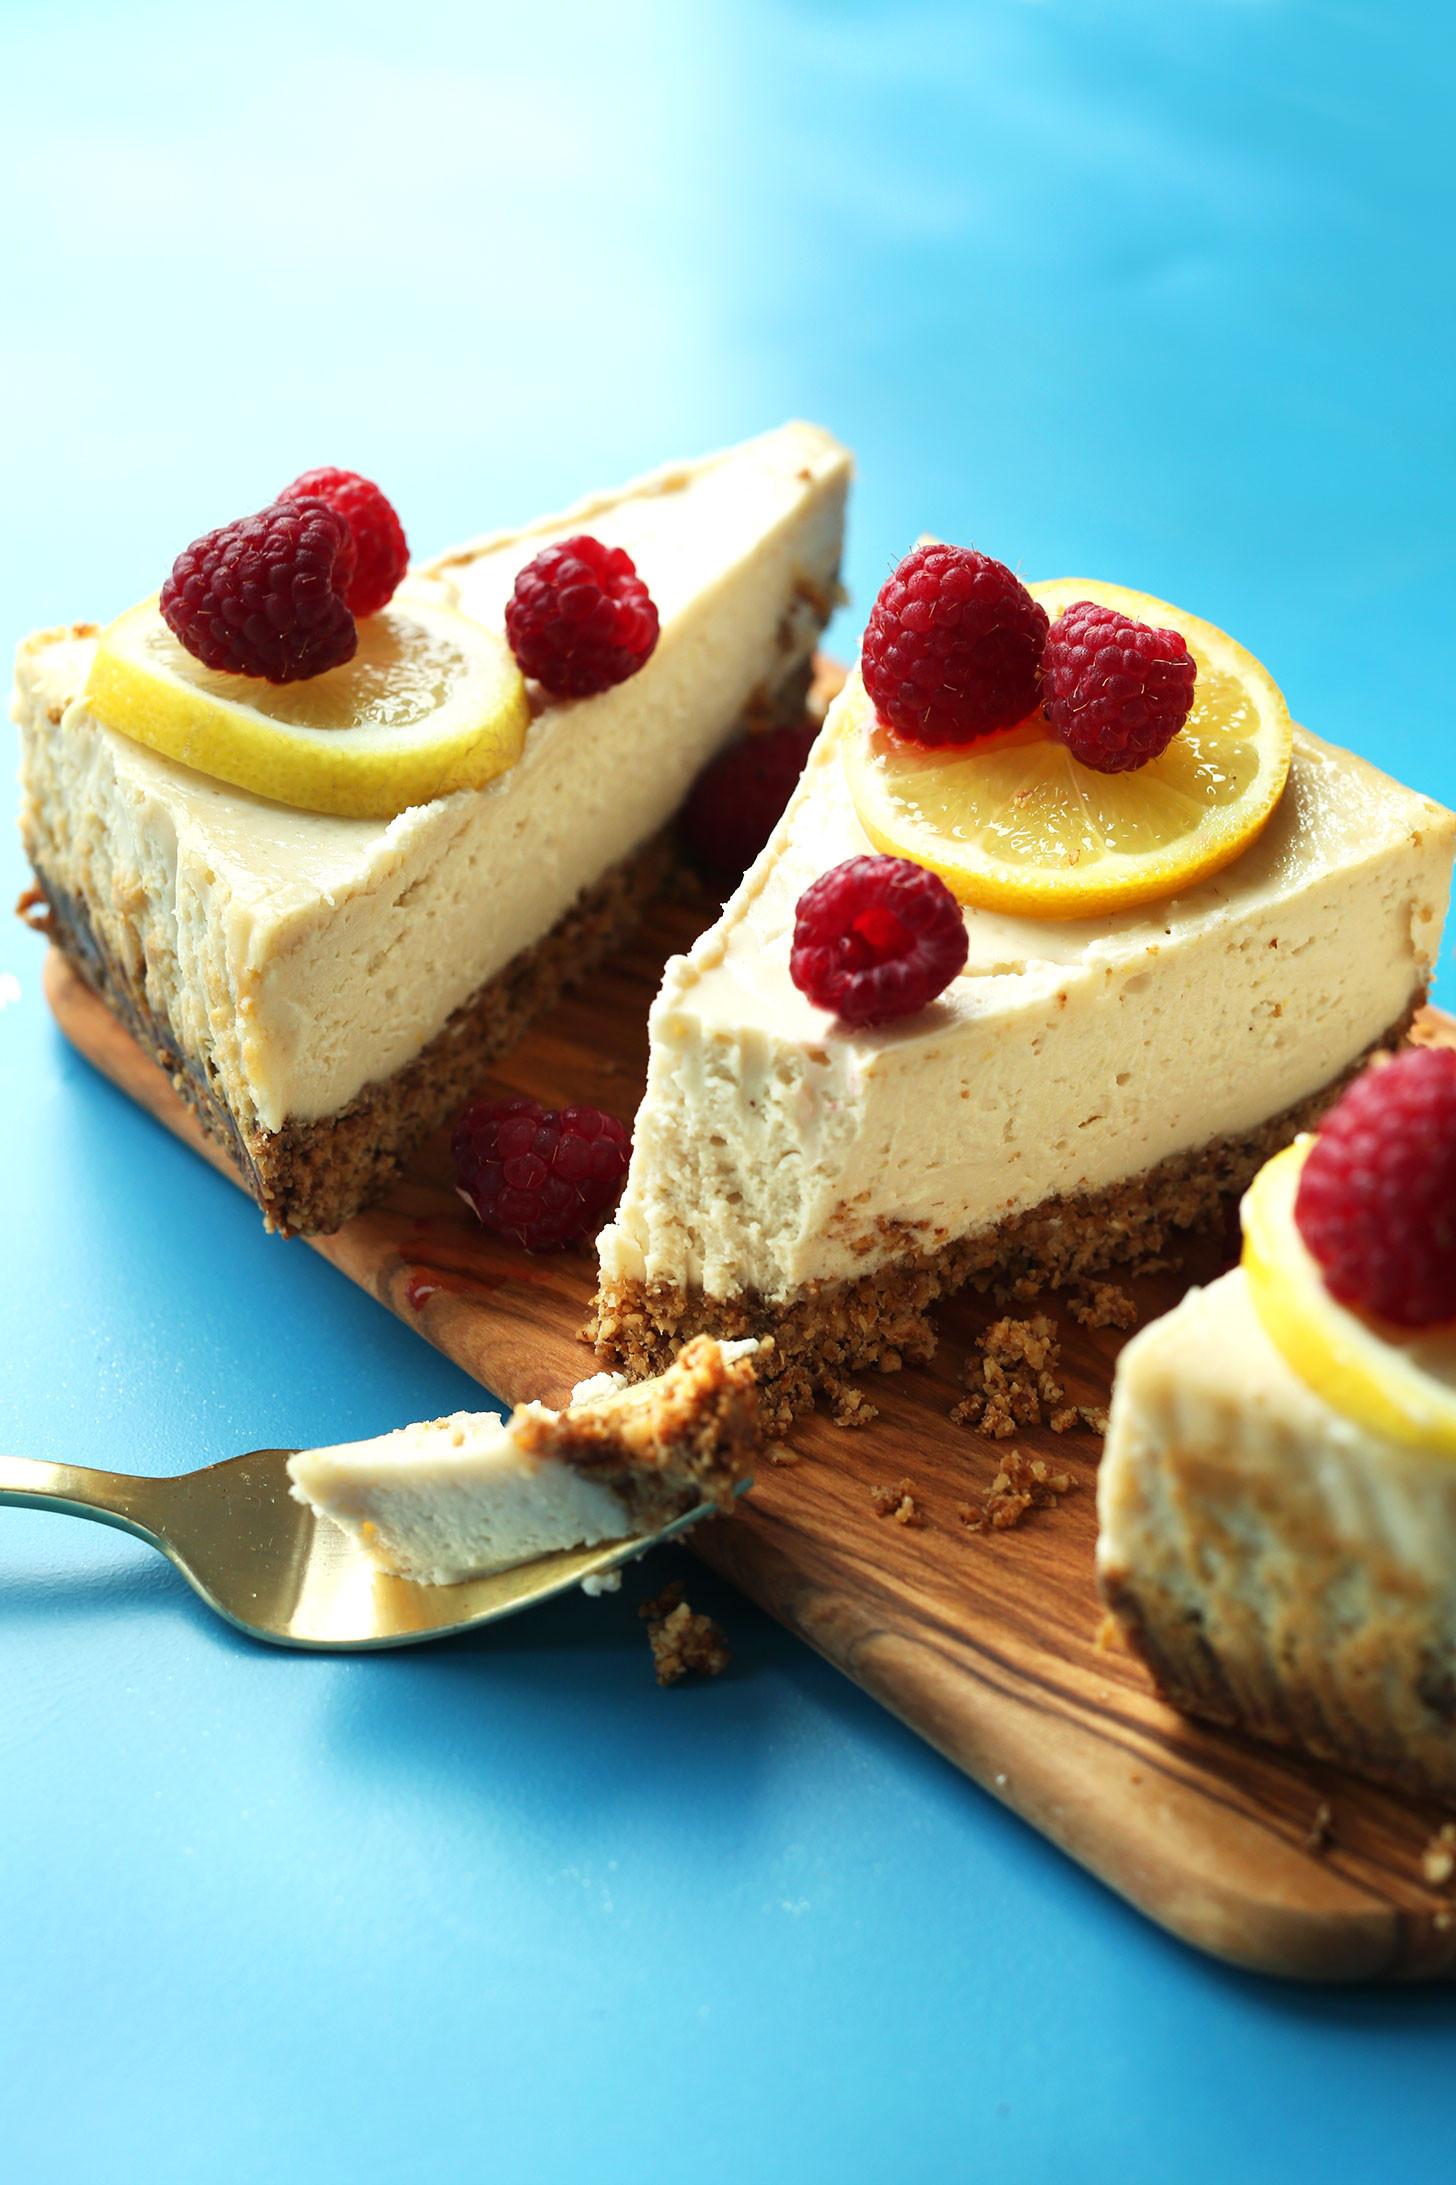 Vegetarian Cheese Cake  Easy Baked Cheesecake Vegan GF